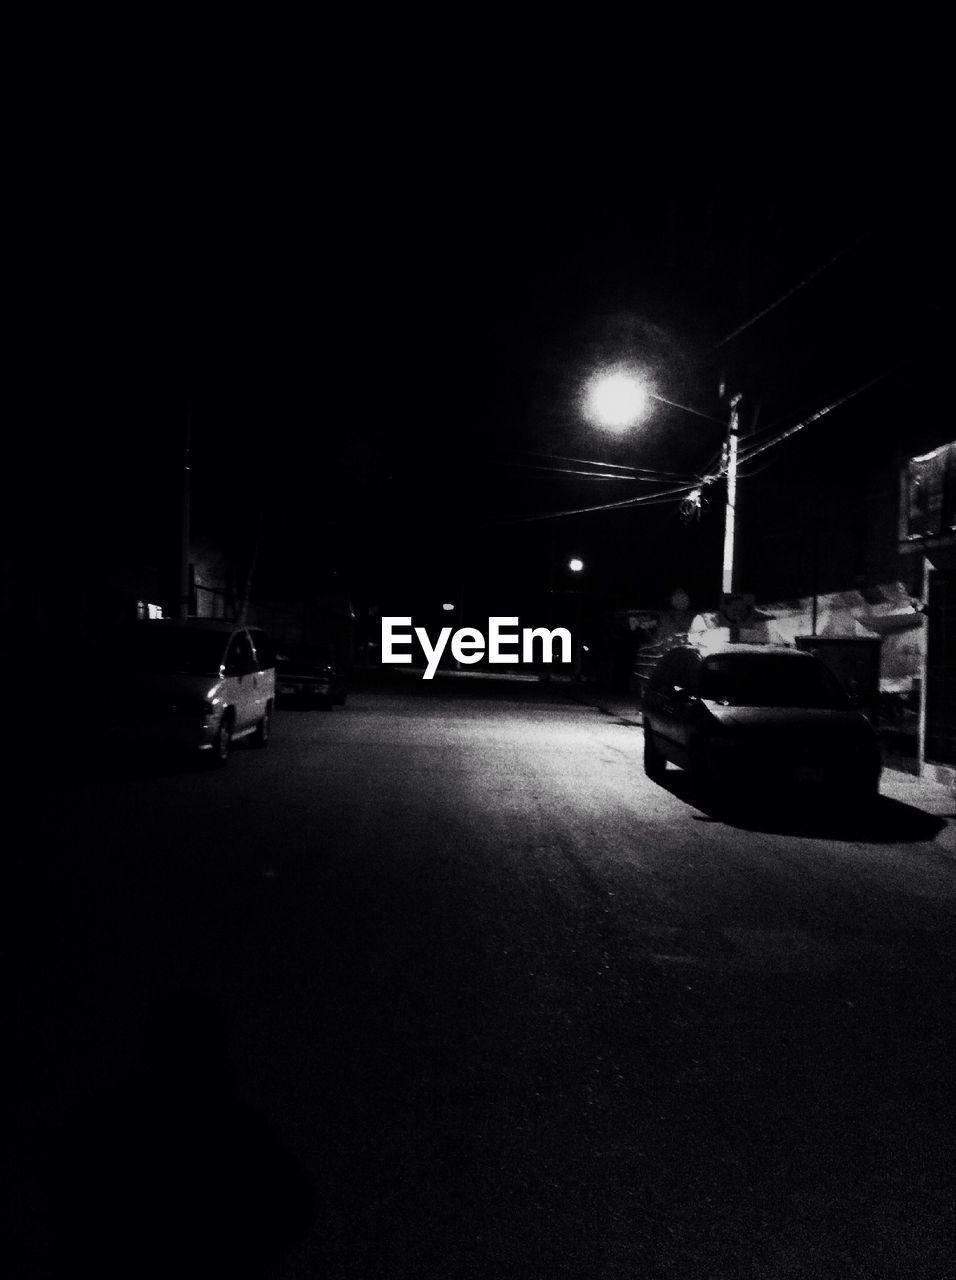 night, illuminated, transportation, land vehicle, car, mode of transport, street, road, street light, outdoors, no people, city, sky